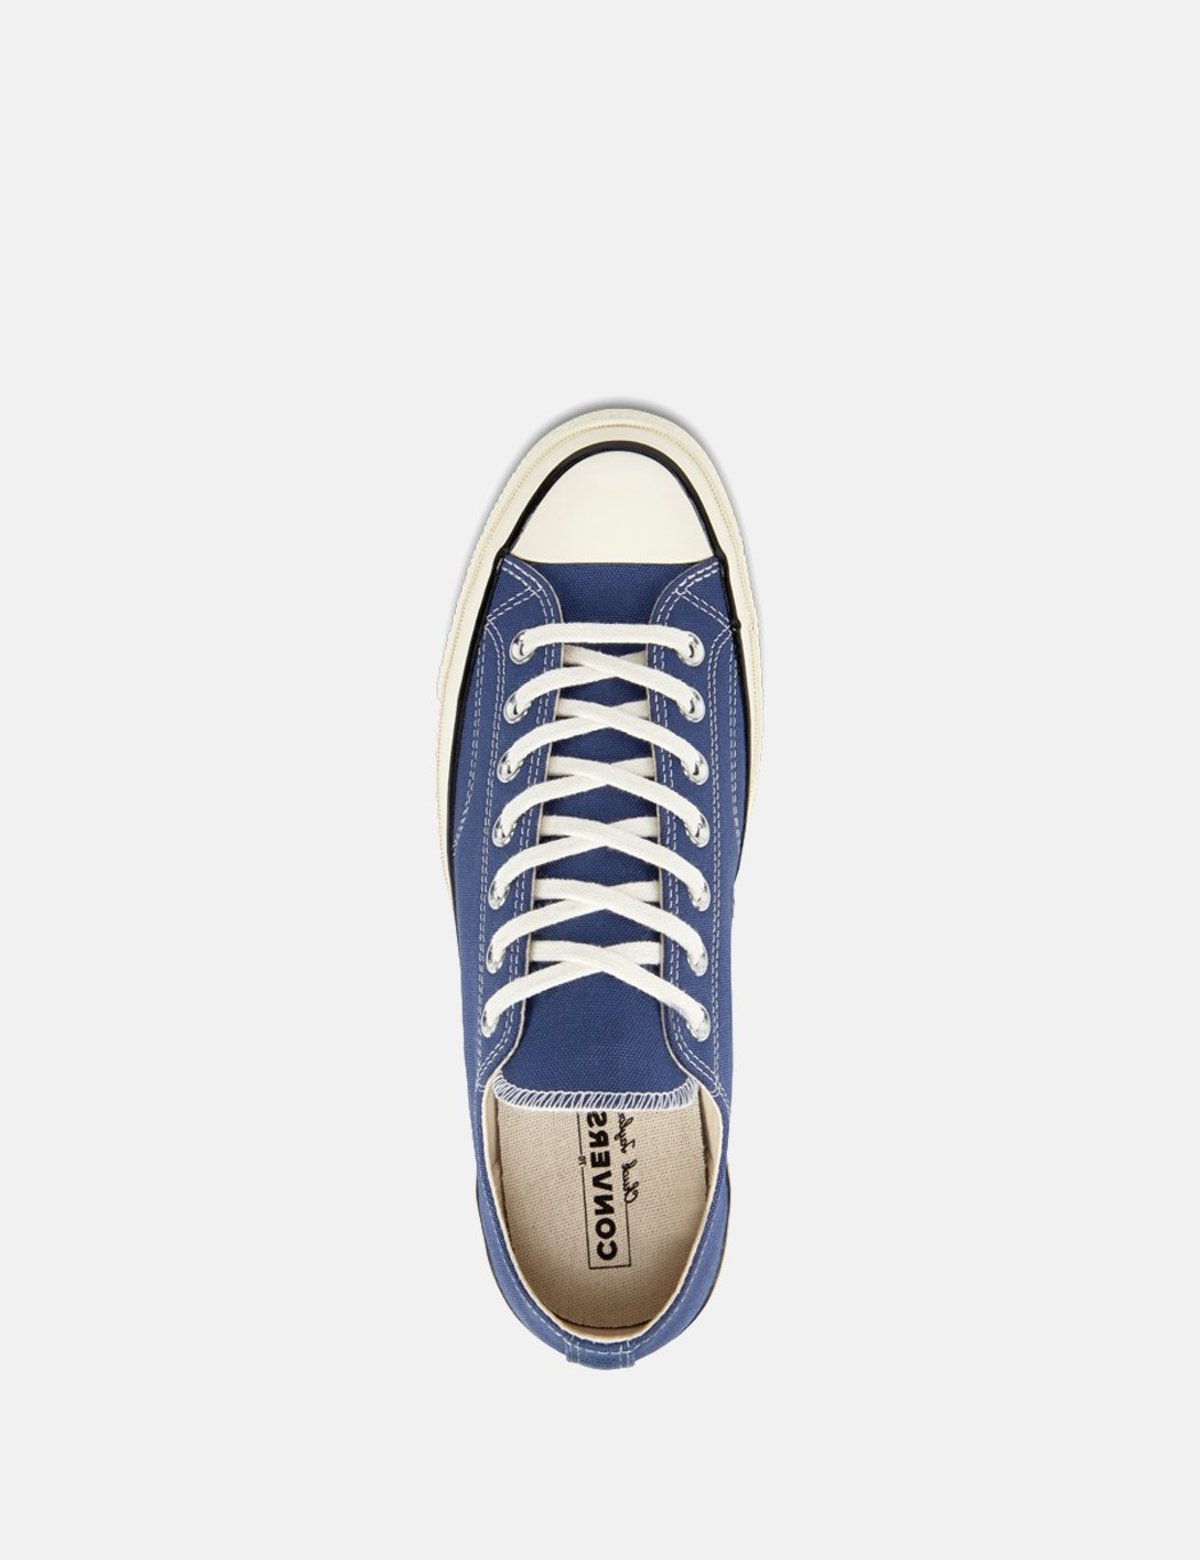 Converse 70's Chuck Low Canvas Sneaker